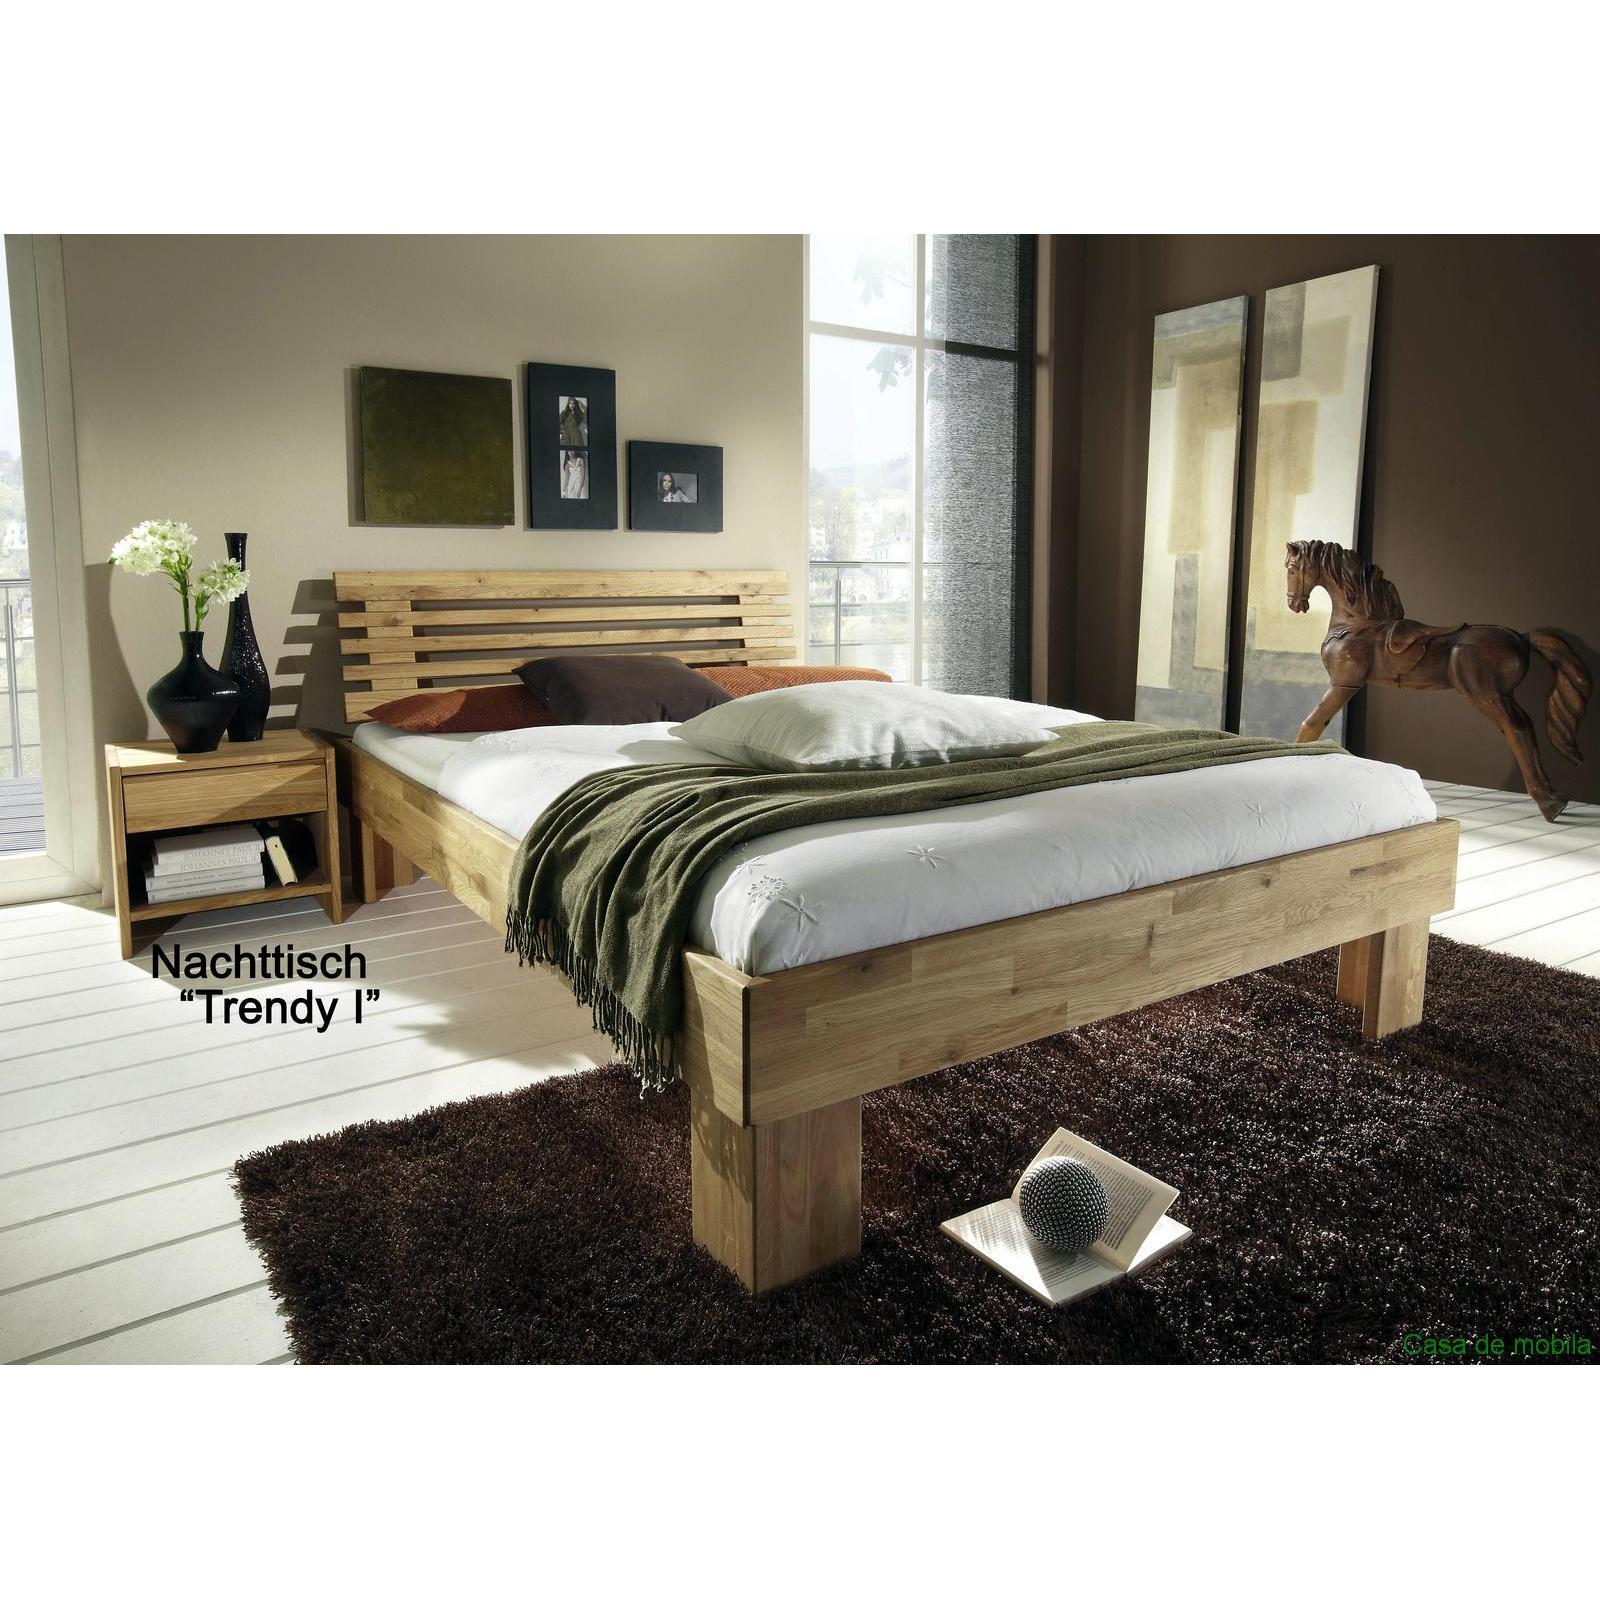 massivholz doppelbett 180x200 eiche massiv holzbett gamma bett wildeiche ge lt ebay. Black Bedroom Furniture Sets. Home Design Ideas